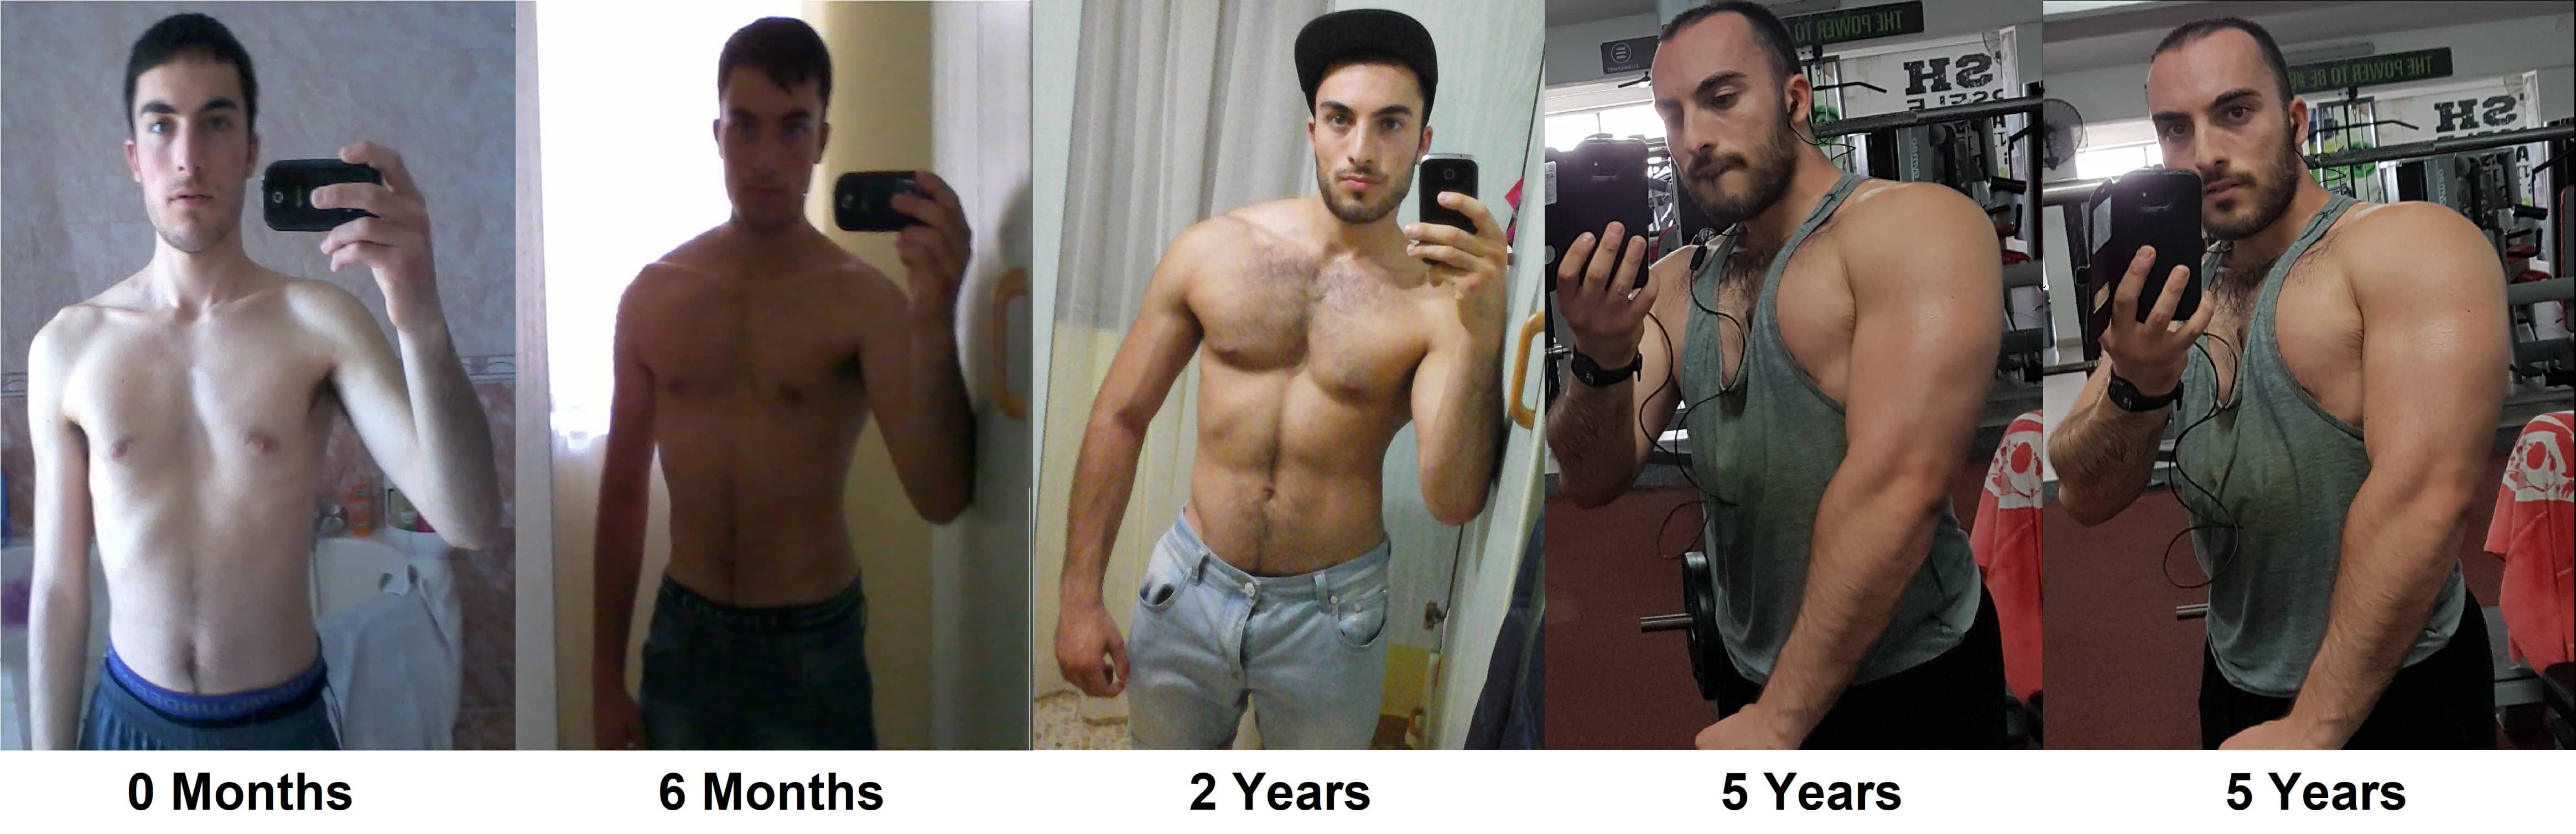 5 Years Gym